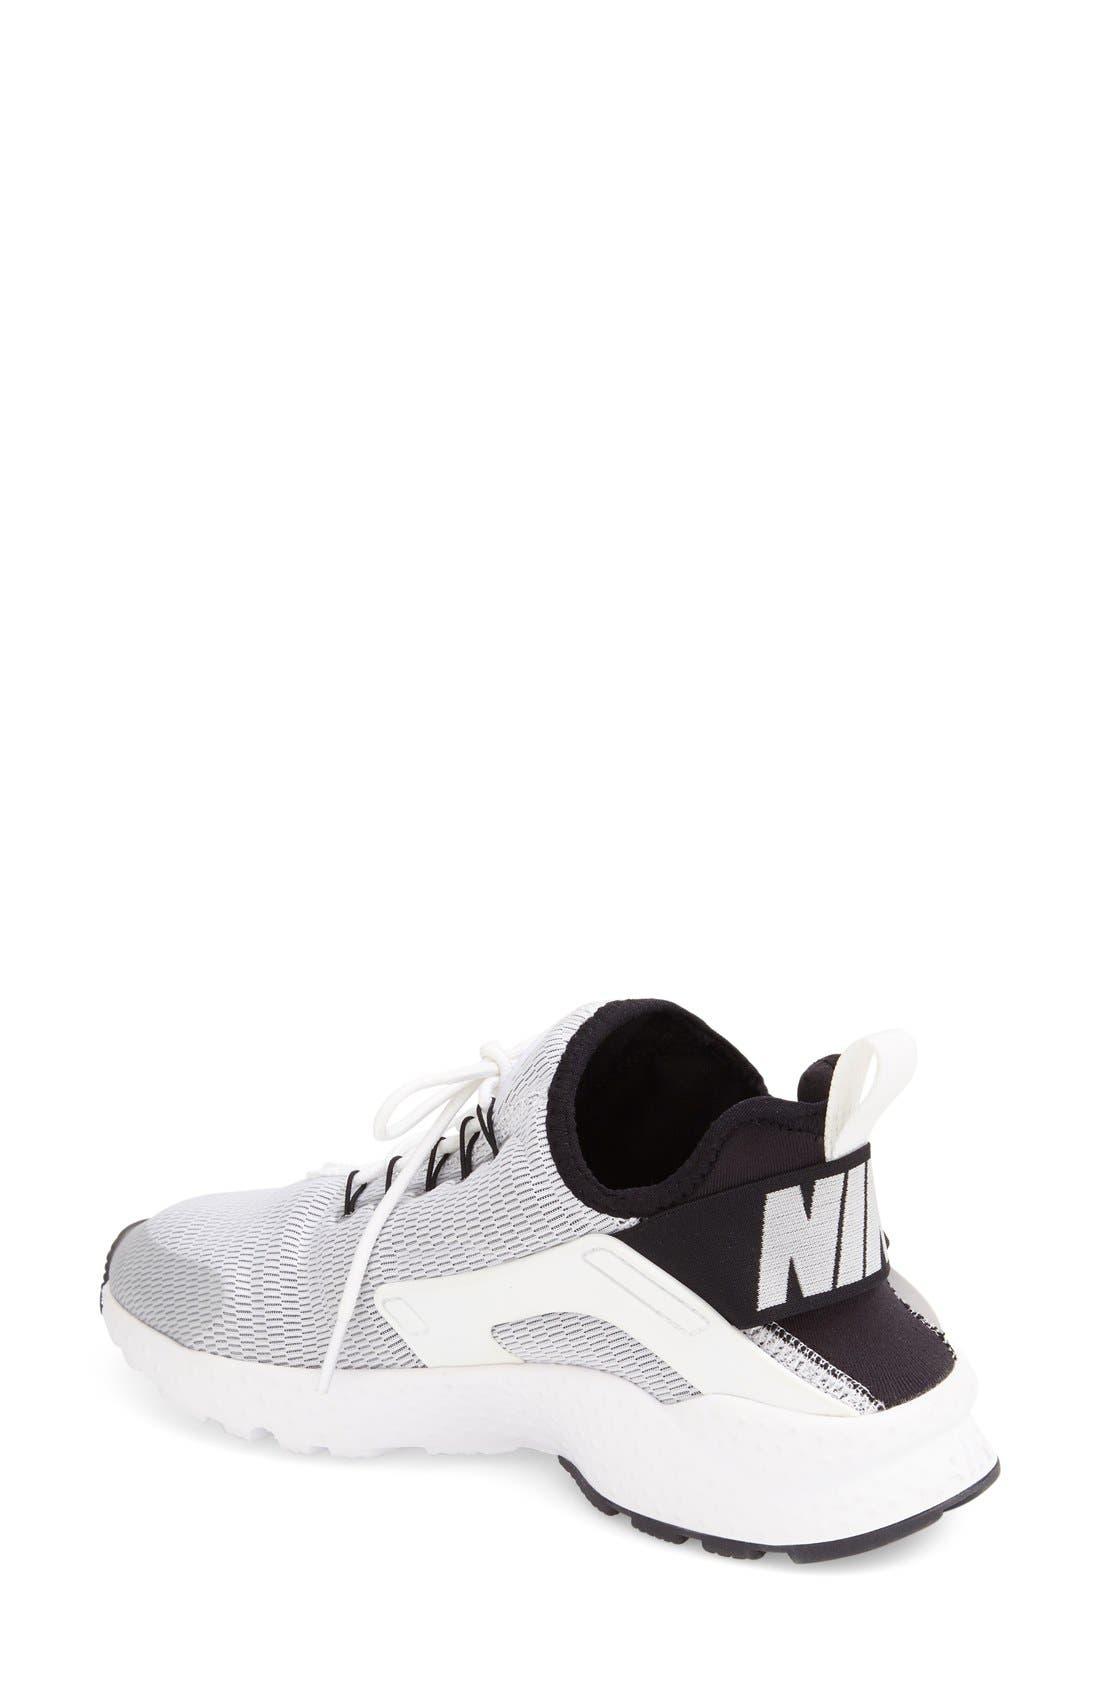 Air Huarache Sneaker,                             Alternate thumbnail 56, color,